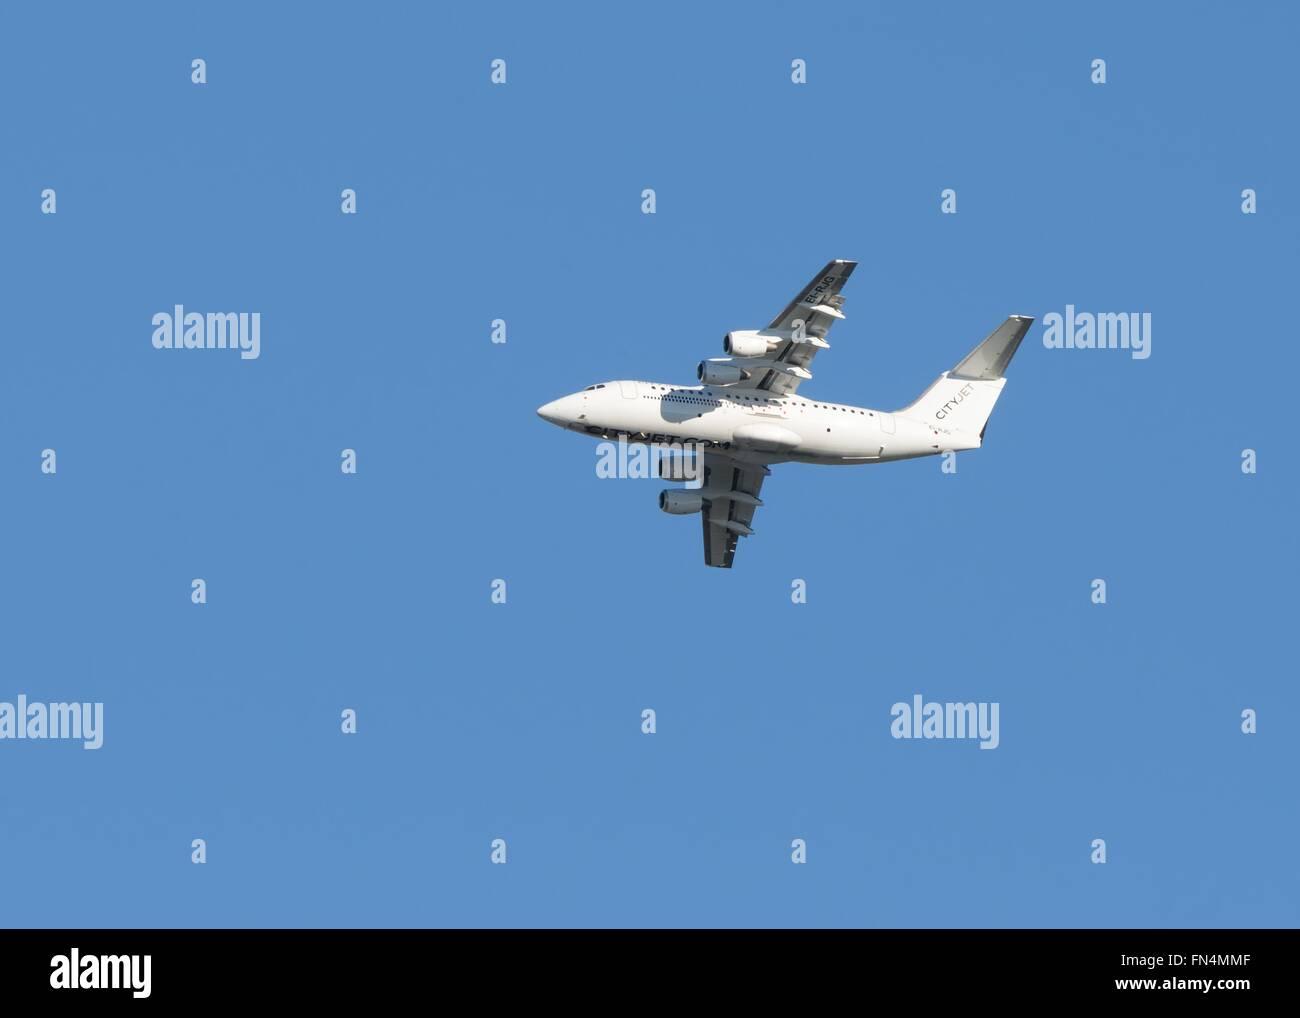 City Jet EI-RJG flying from Prestwick, Scotland, UK - Stock Image